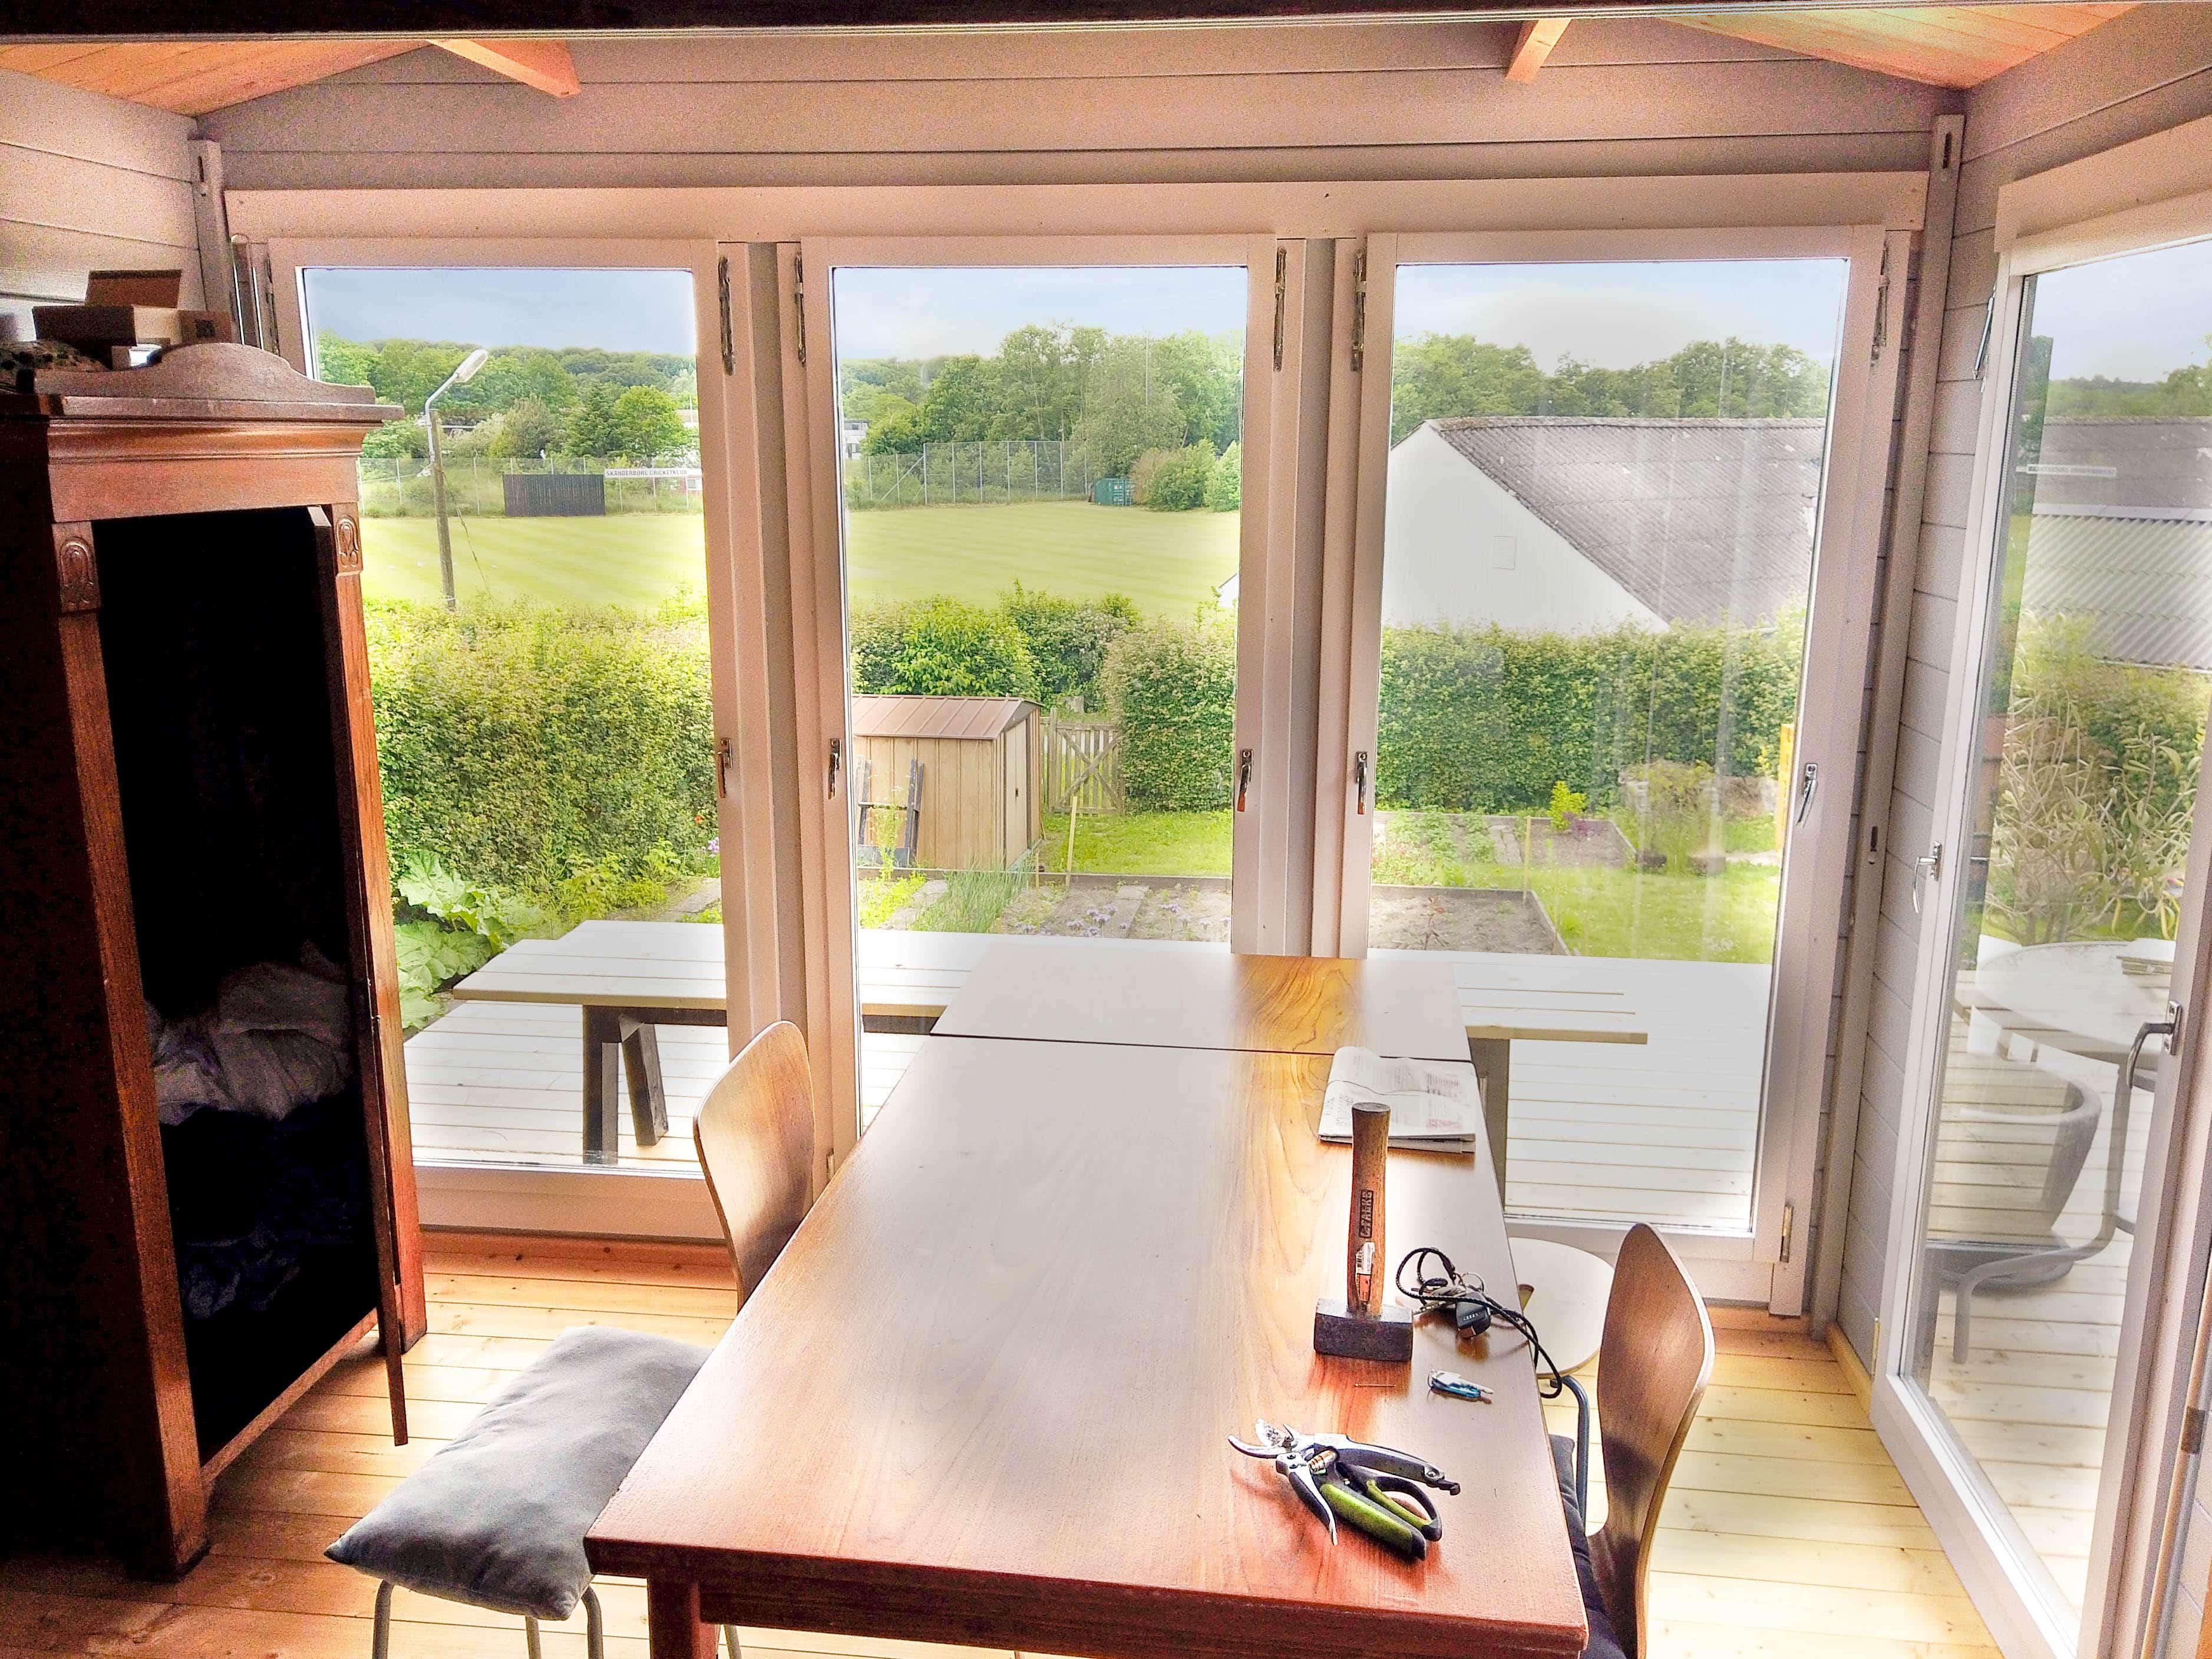 17 m2 kolonihavehus www.sølundhuse.dk